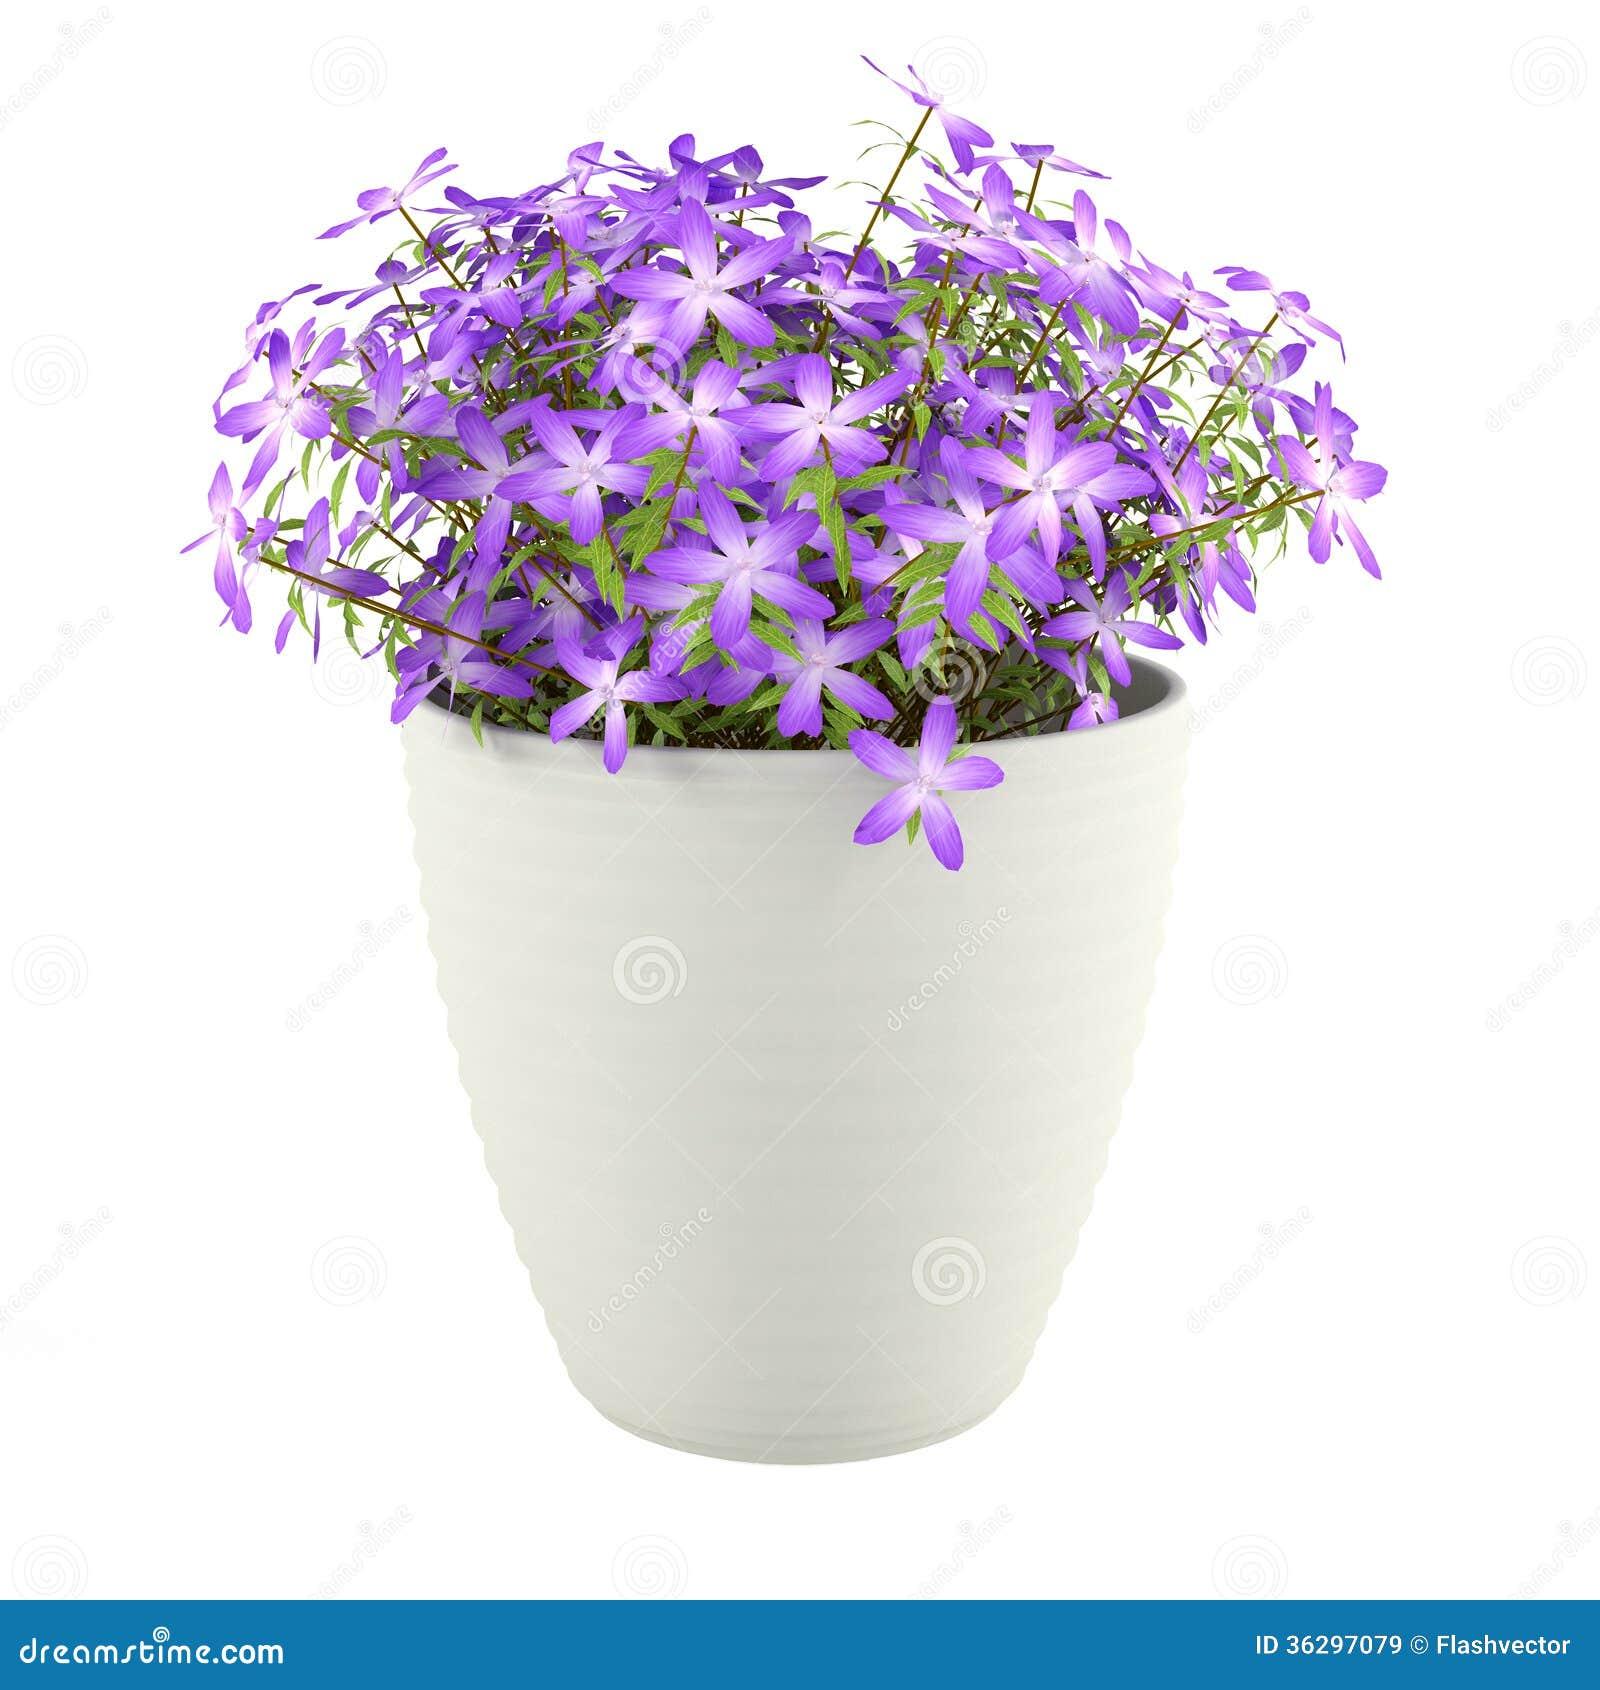 violette blumen im topf lizenzfreie stockbilder bild 36297079. Black Bedroom Furniture Sets. Home Design Ideas